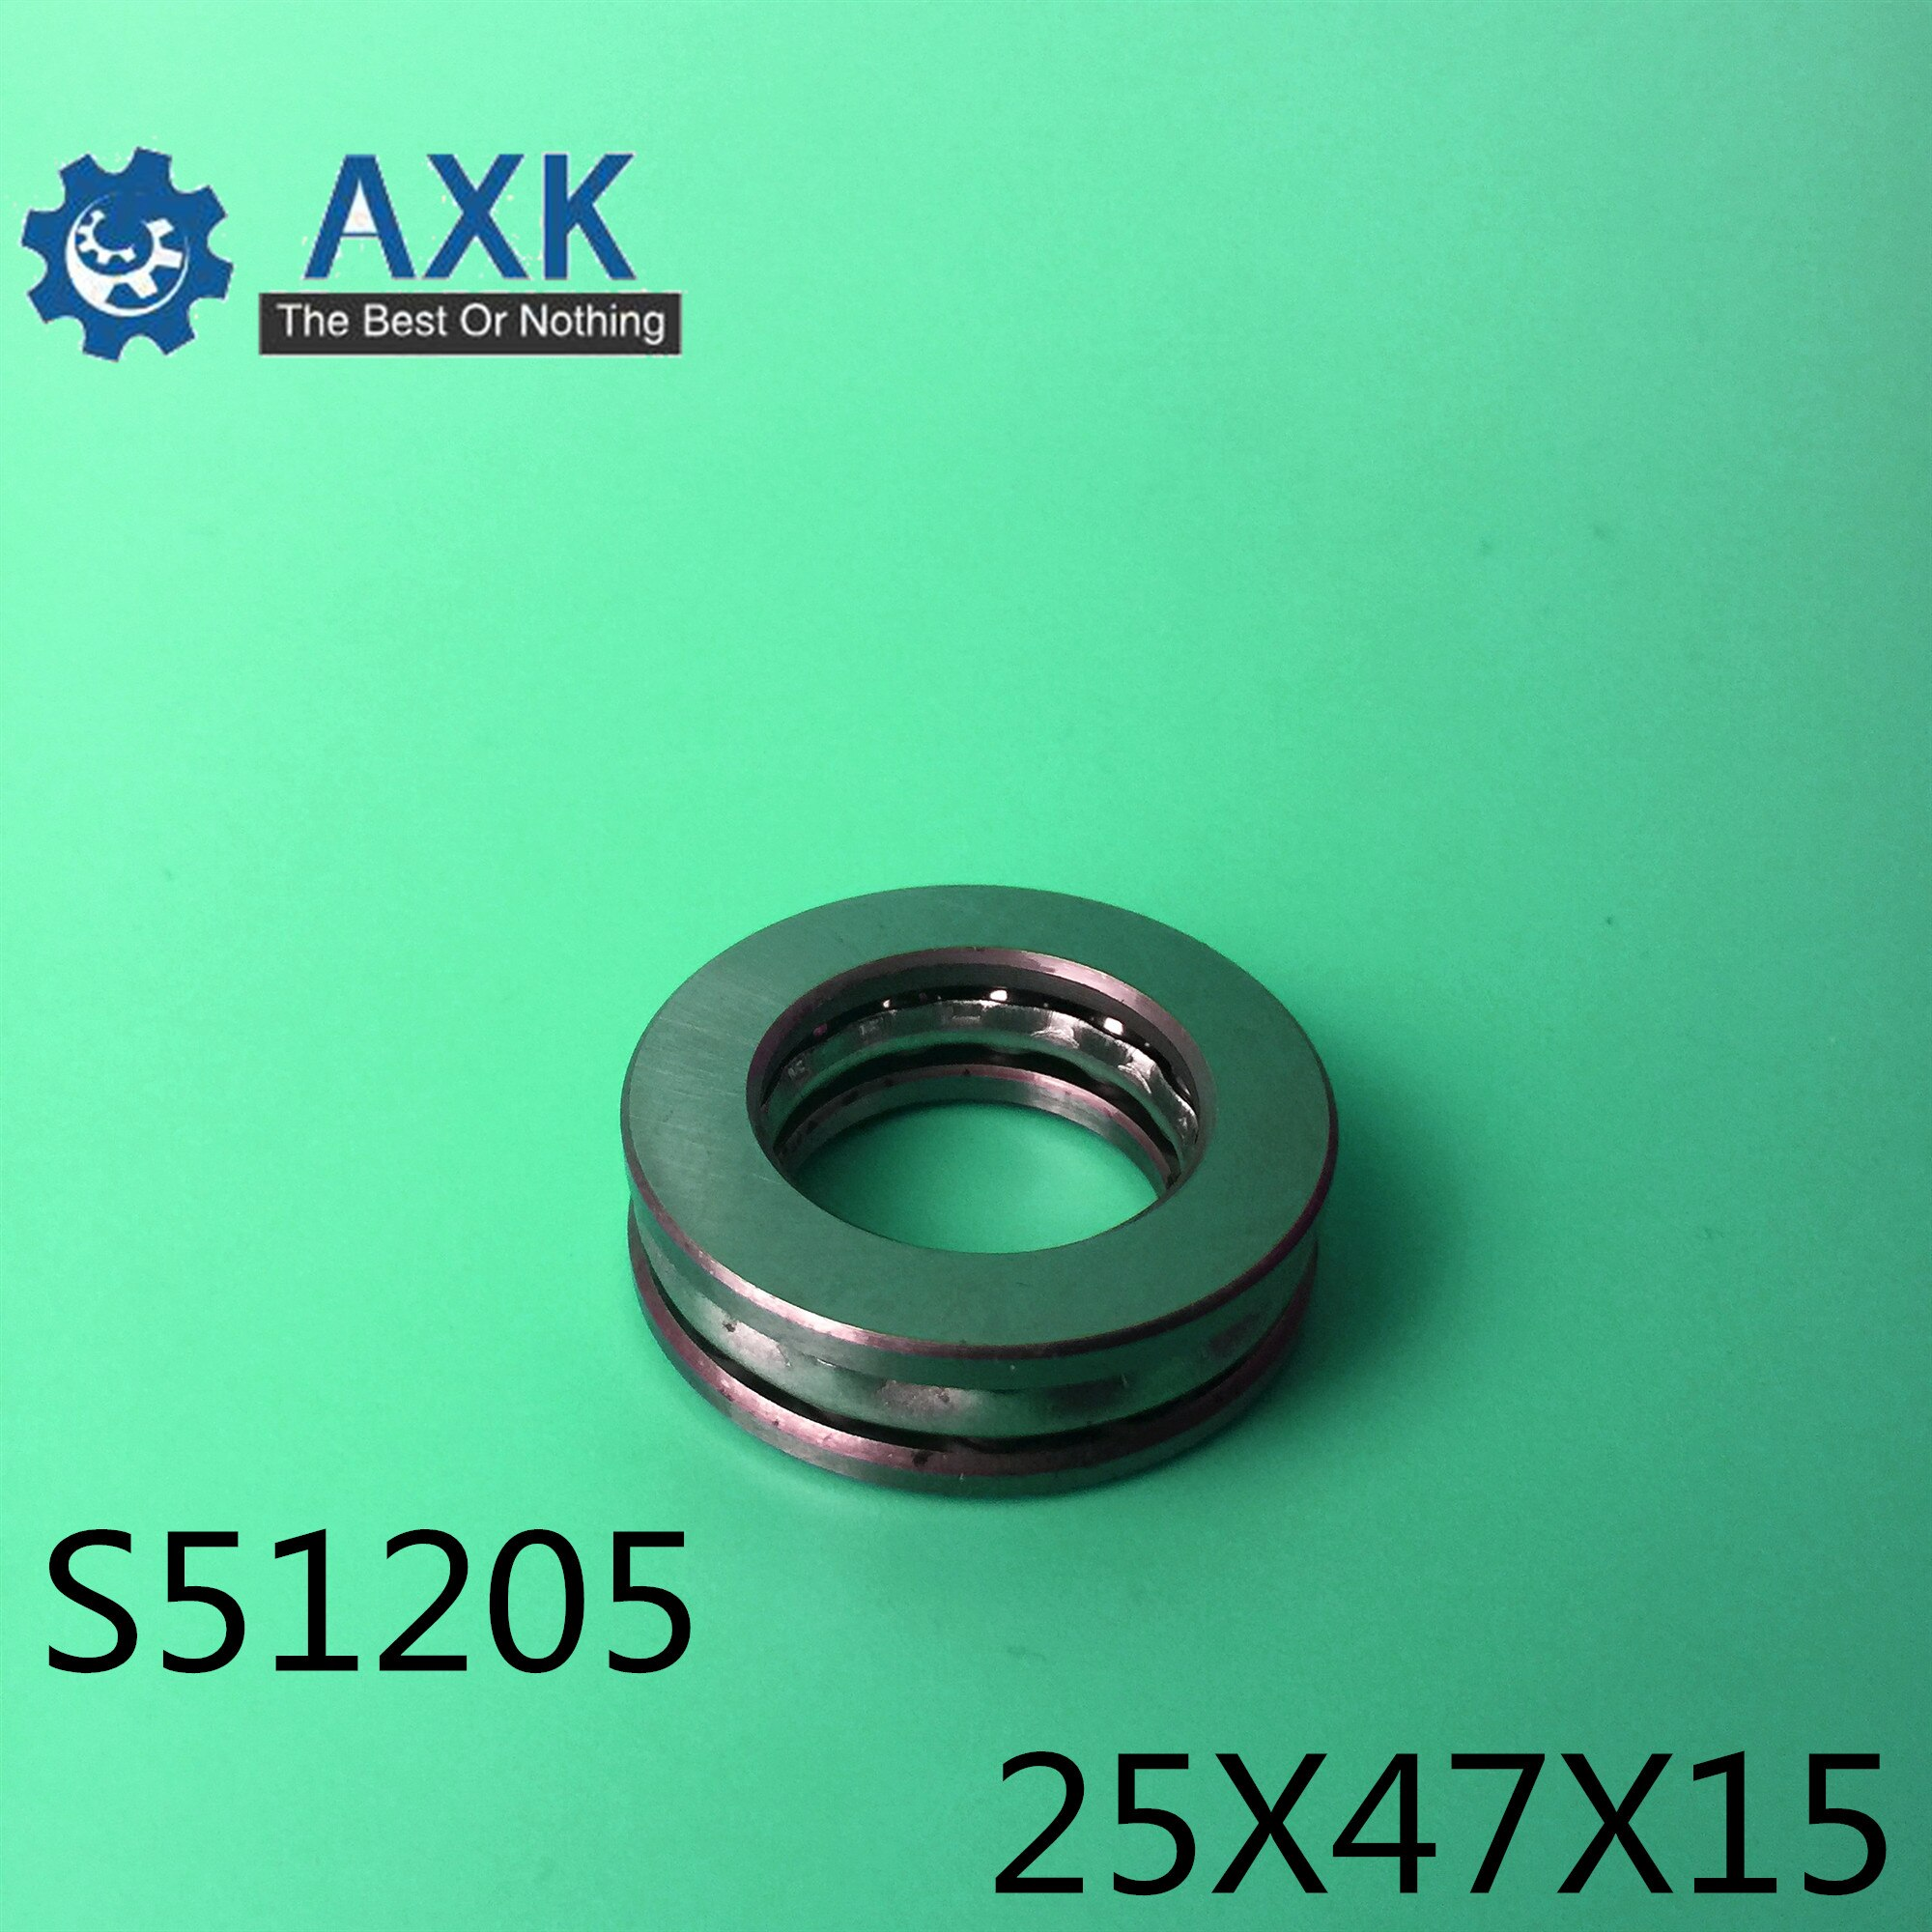 2pcs set stainless steel ball bearing smr105 2os cb abec 7 ld 5 10 4mm S51205 Bearing 25*47*15 mm ( 2PCS ) ABEC-1 Stainless Steel Thrust S 51205 Ball Bearings